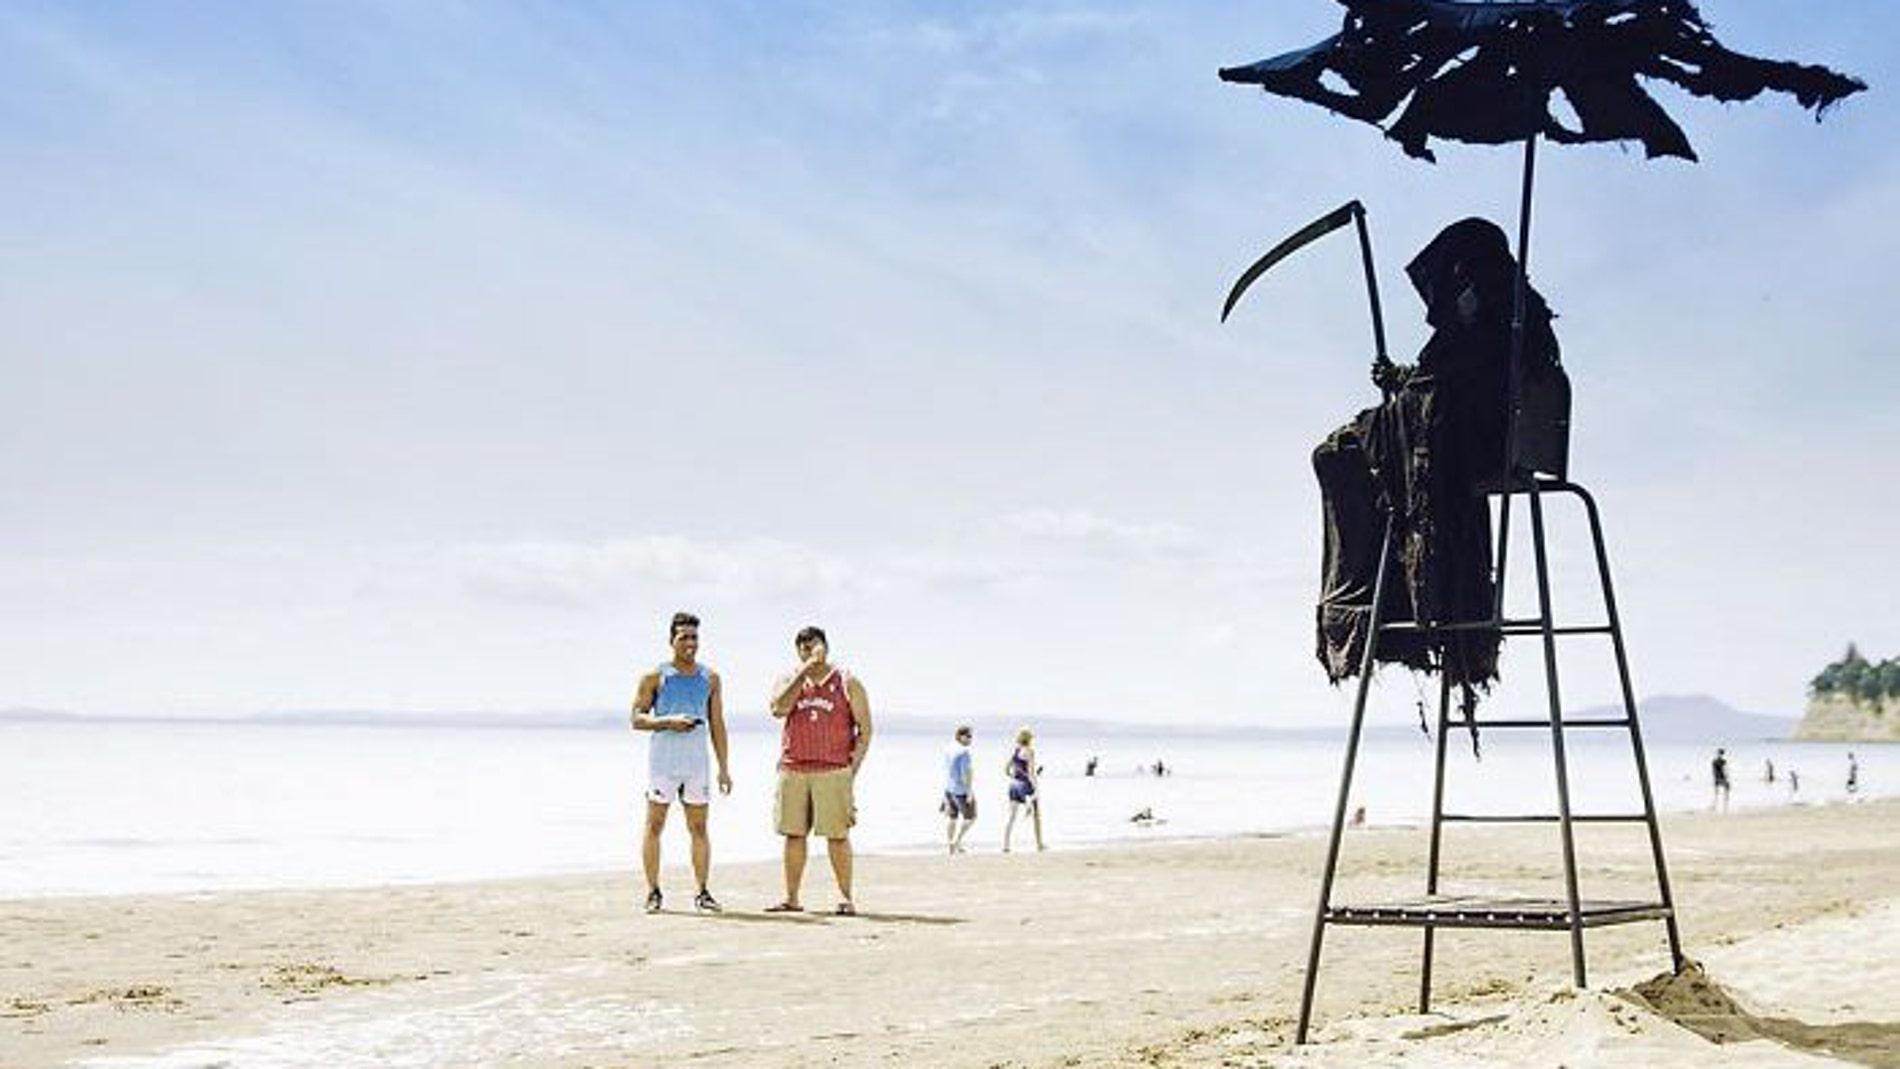 grim-reaper-beach-instagram-photos-swimreaper-coverimage.jpg